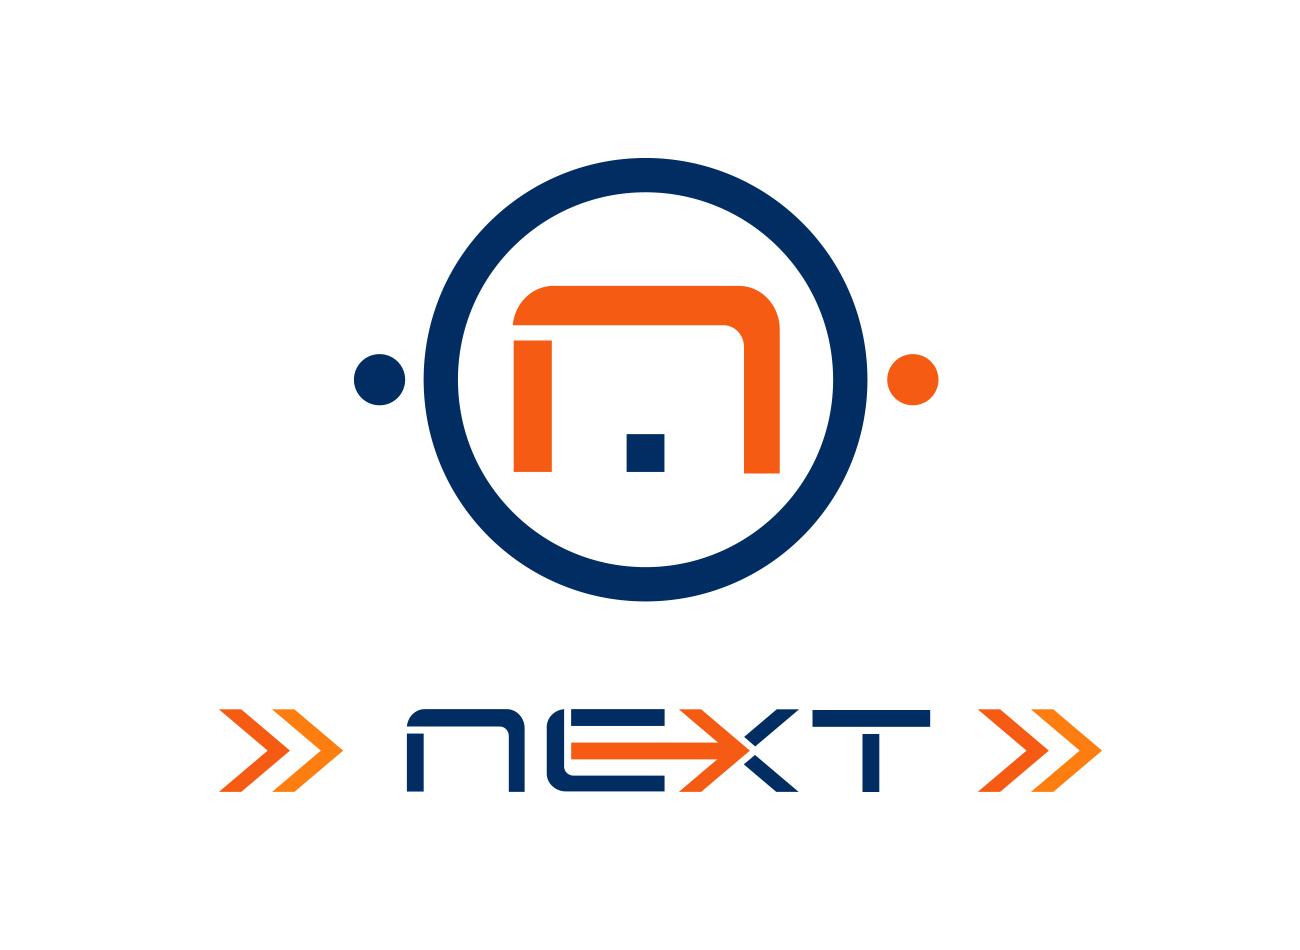 next-graphic-logo-design-agent-orange-creative-agency-south-african-branding-company.jpg